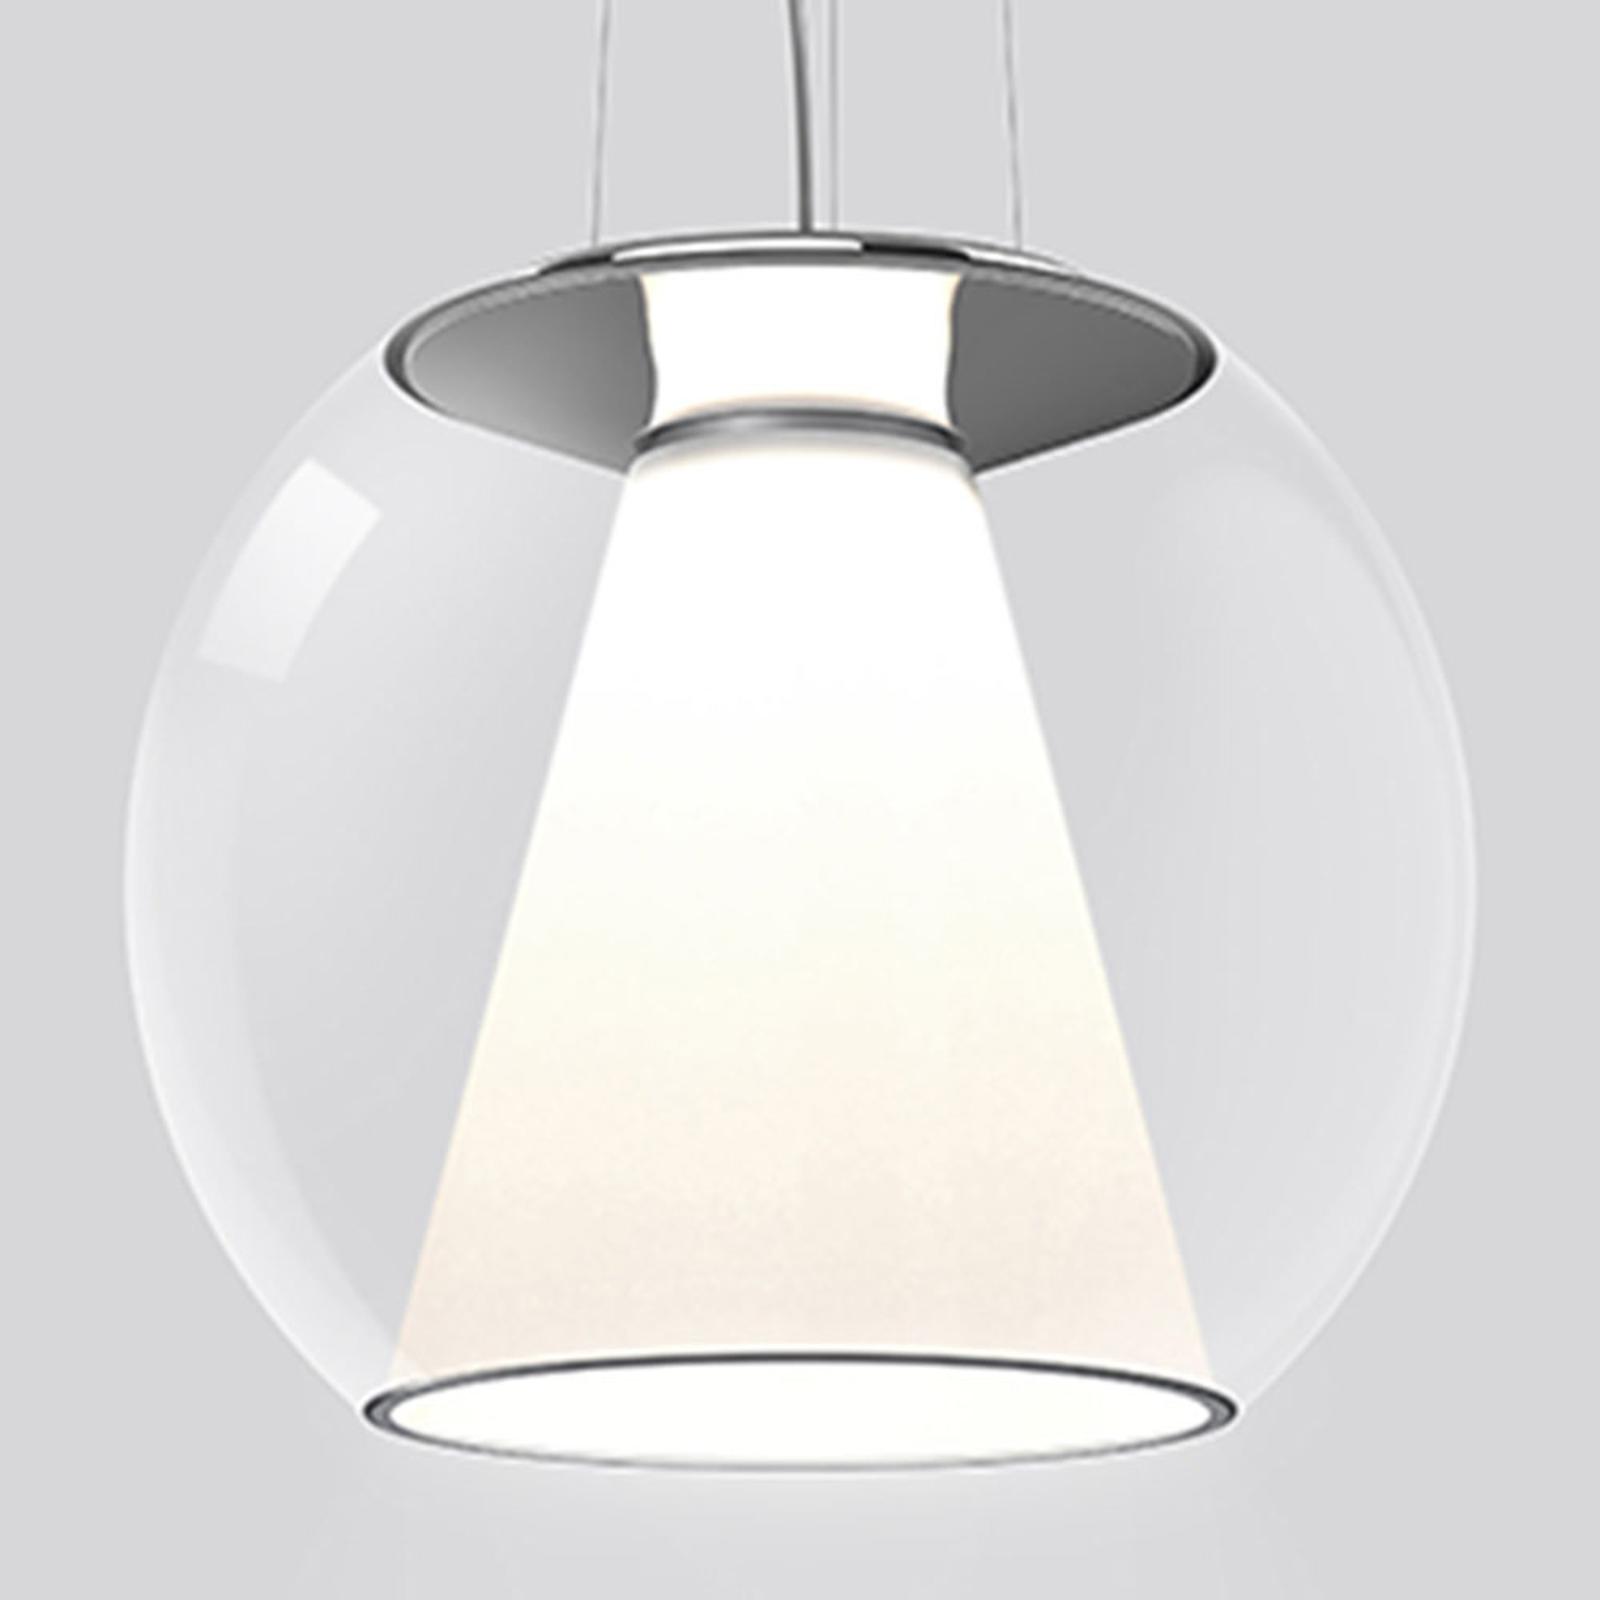 serien.lighting Draft M Hängelampe 927 Triac klar